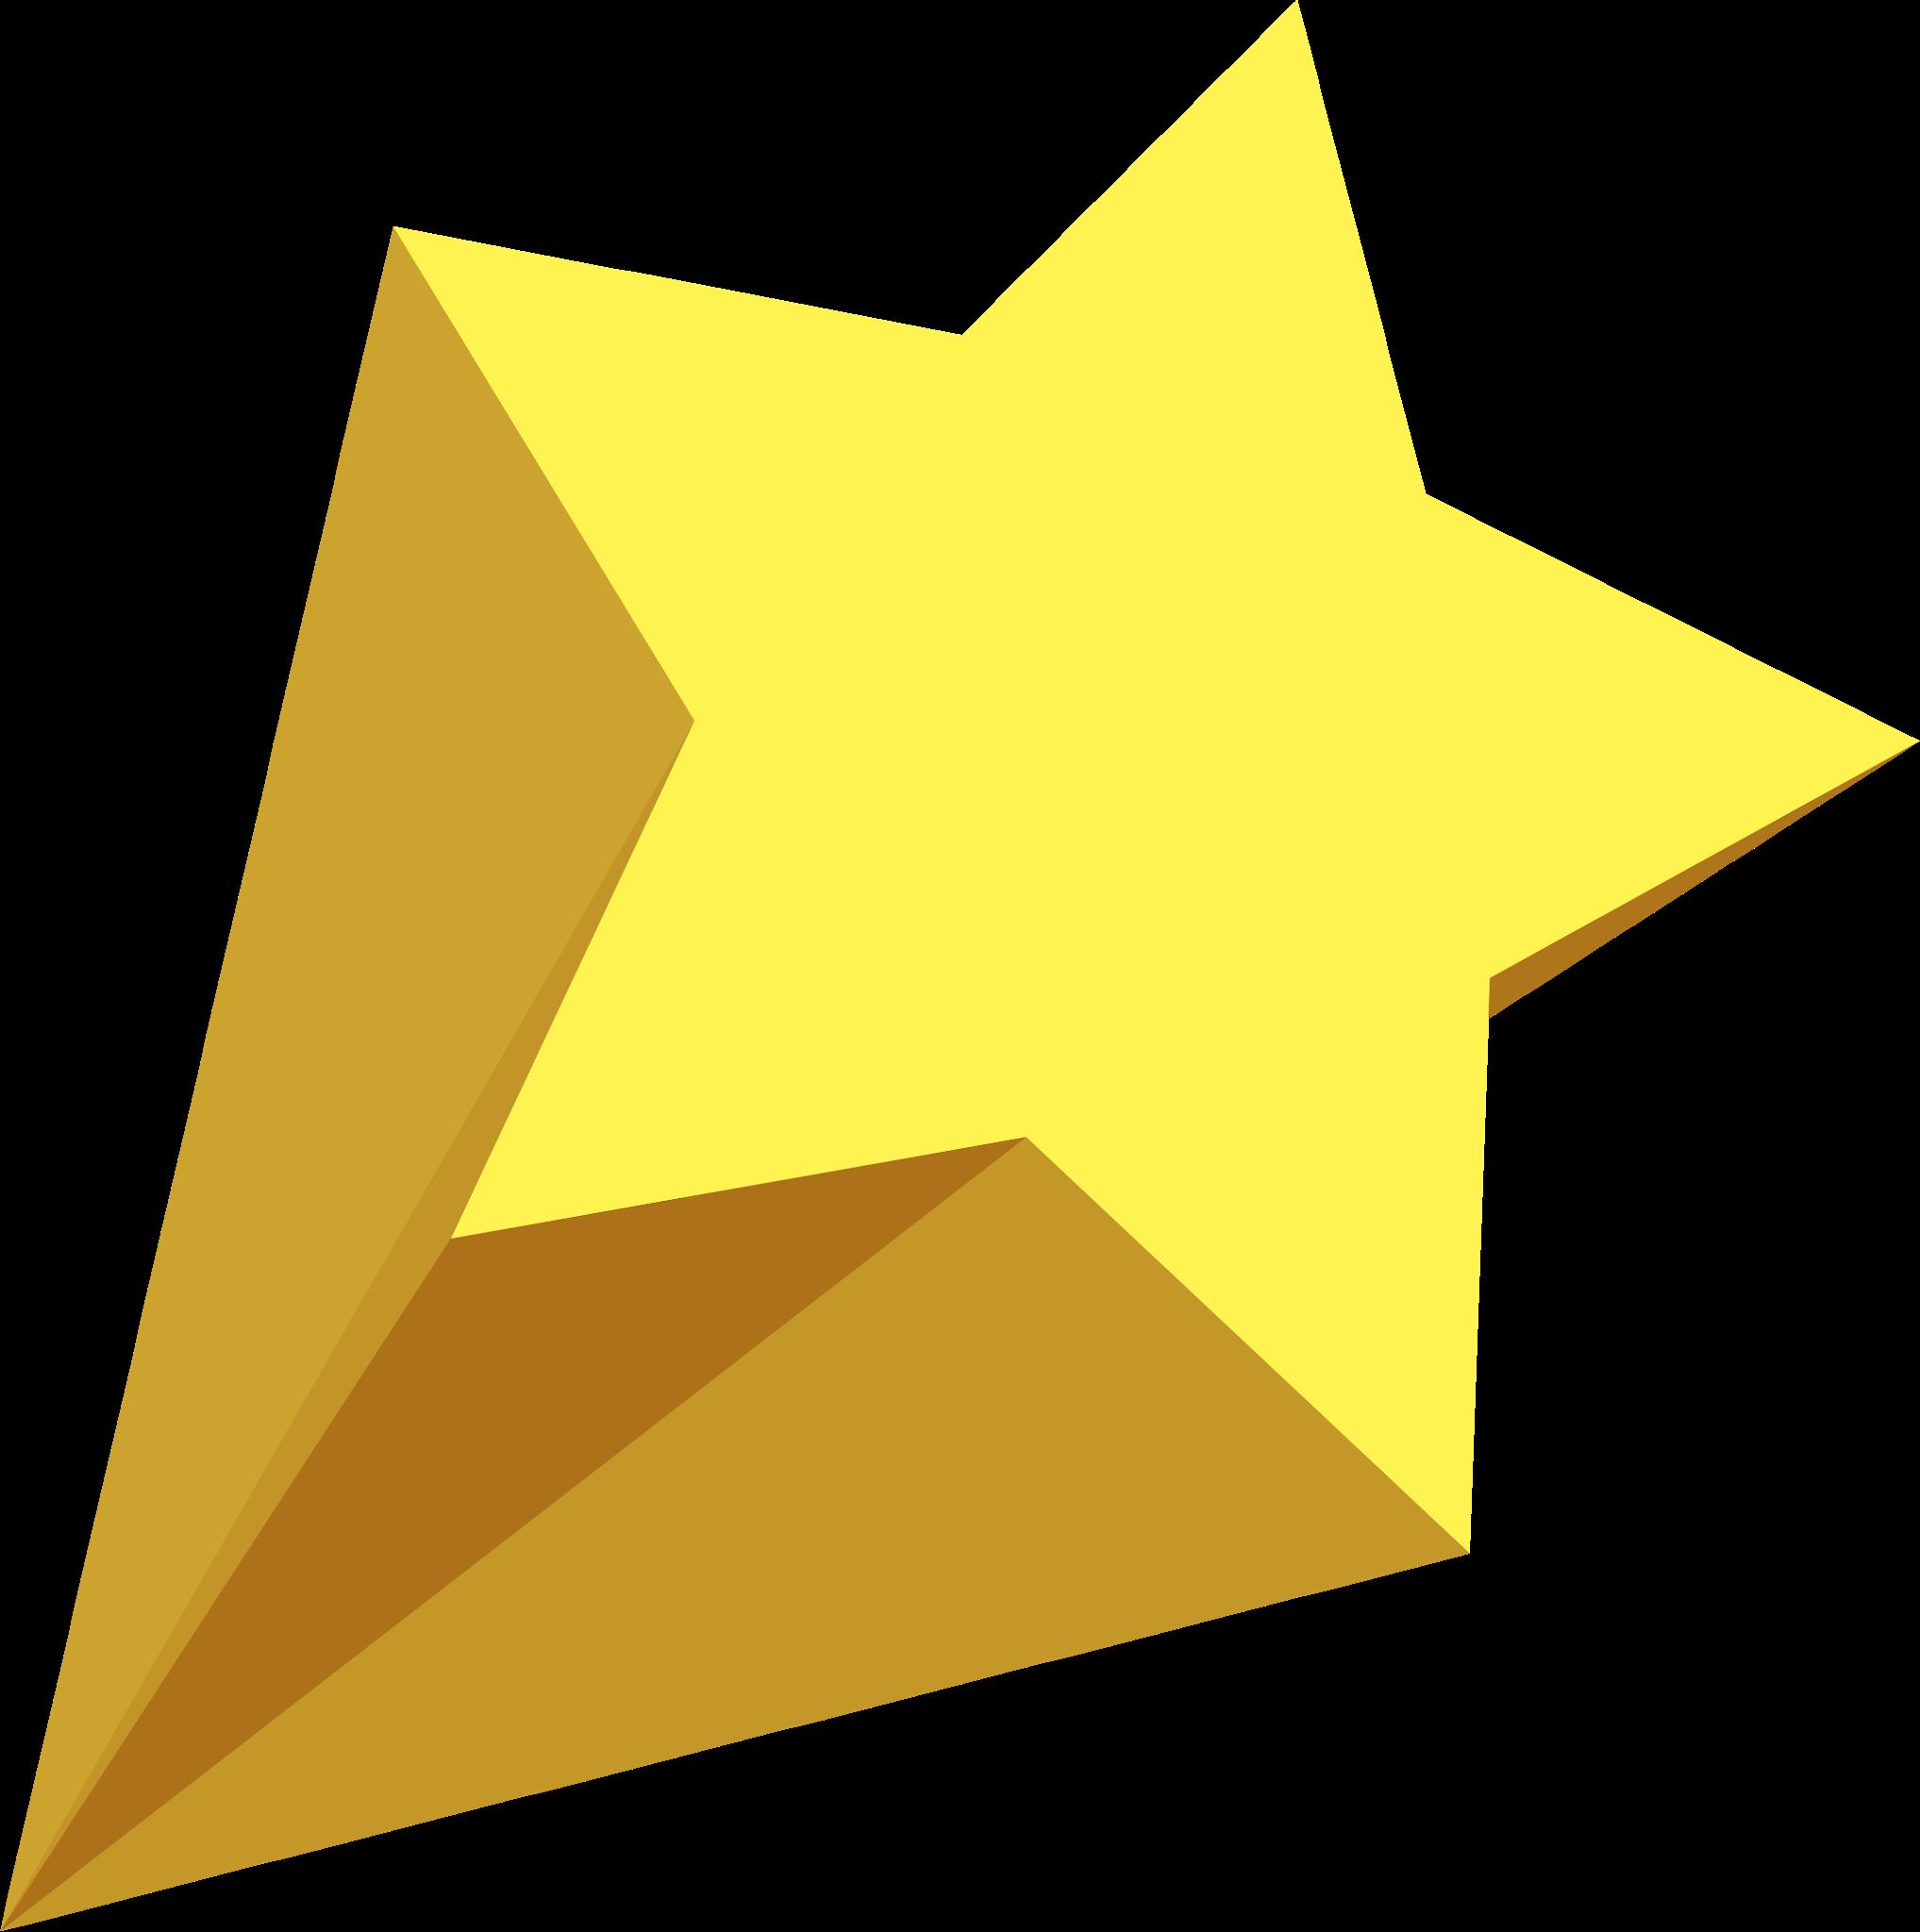 render estrella